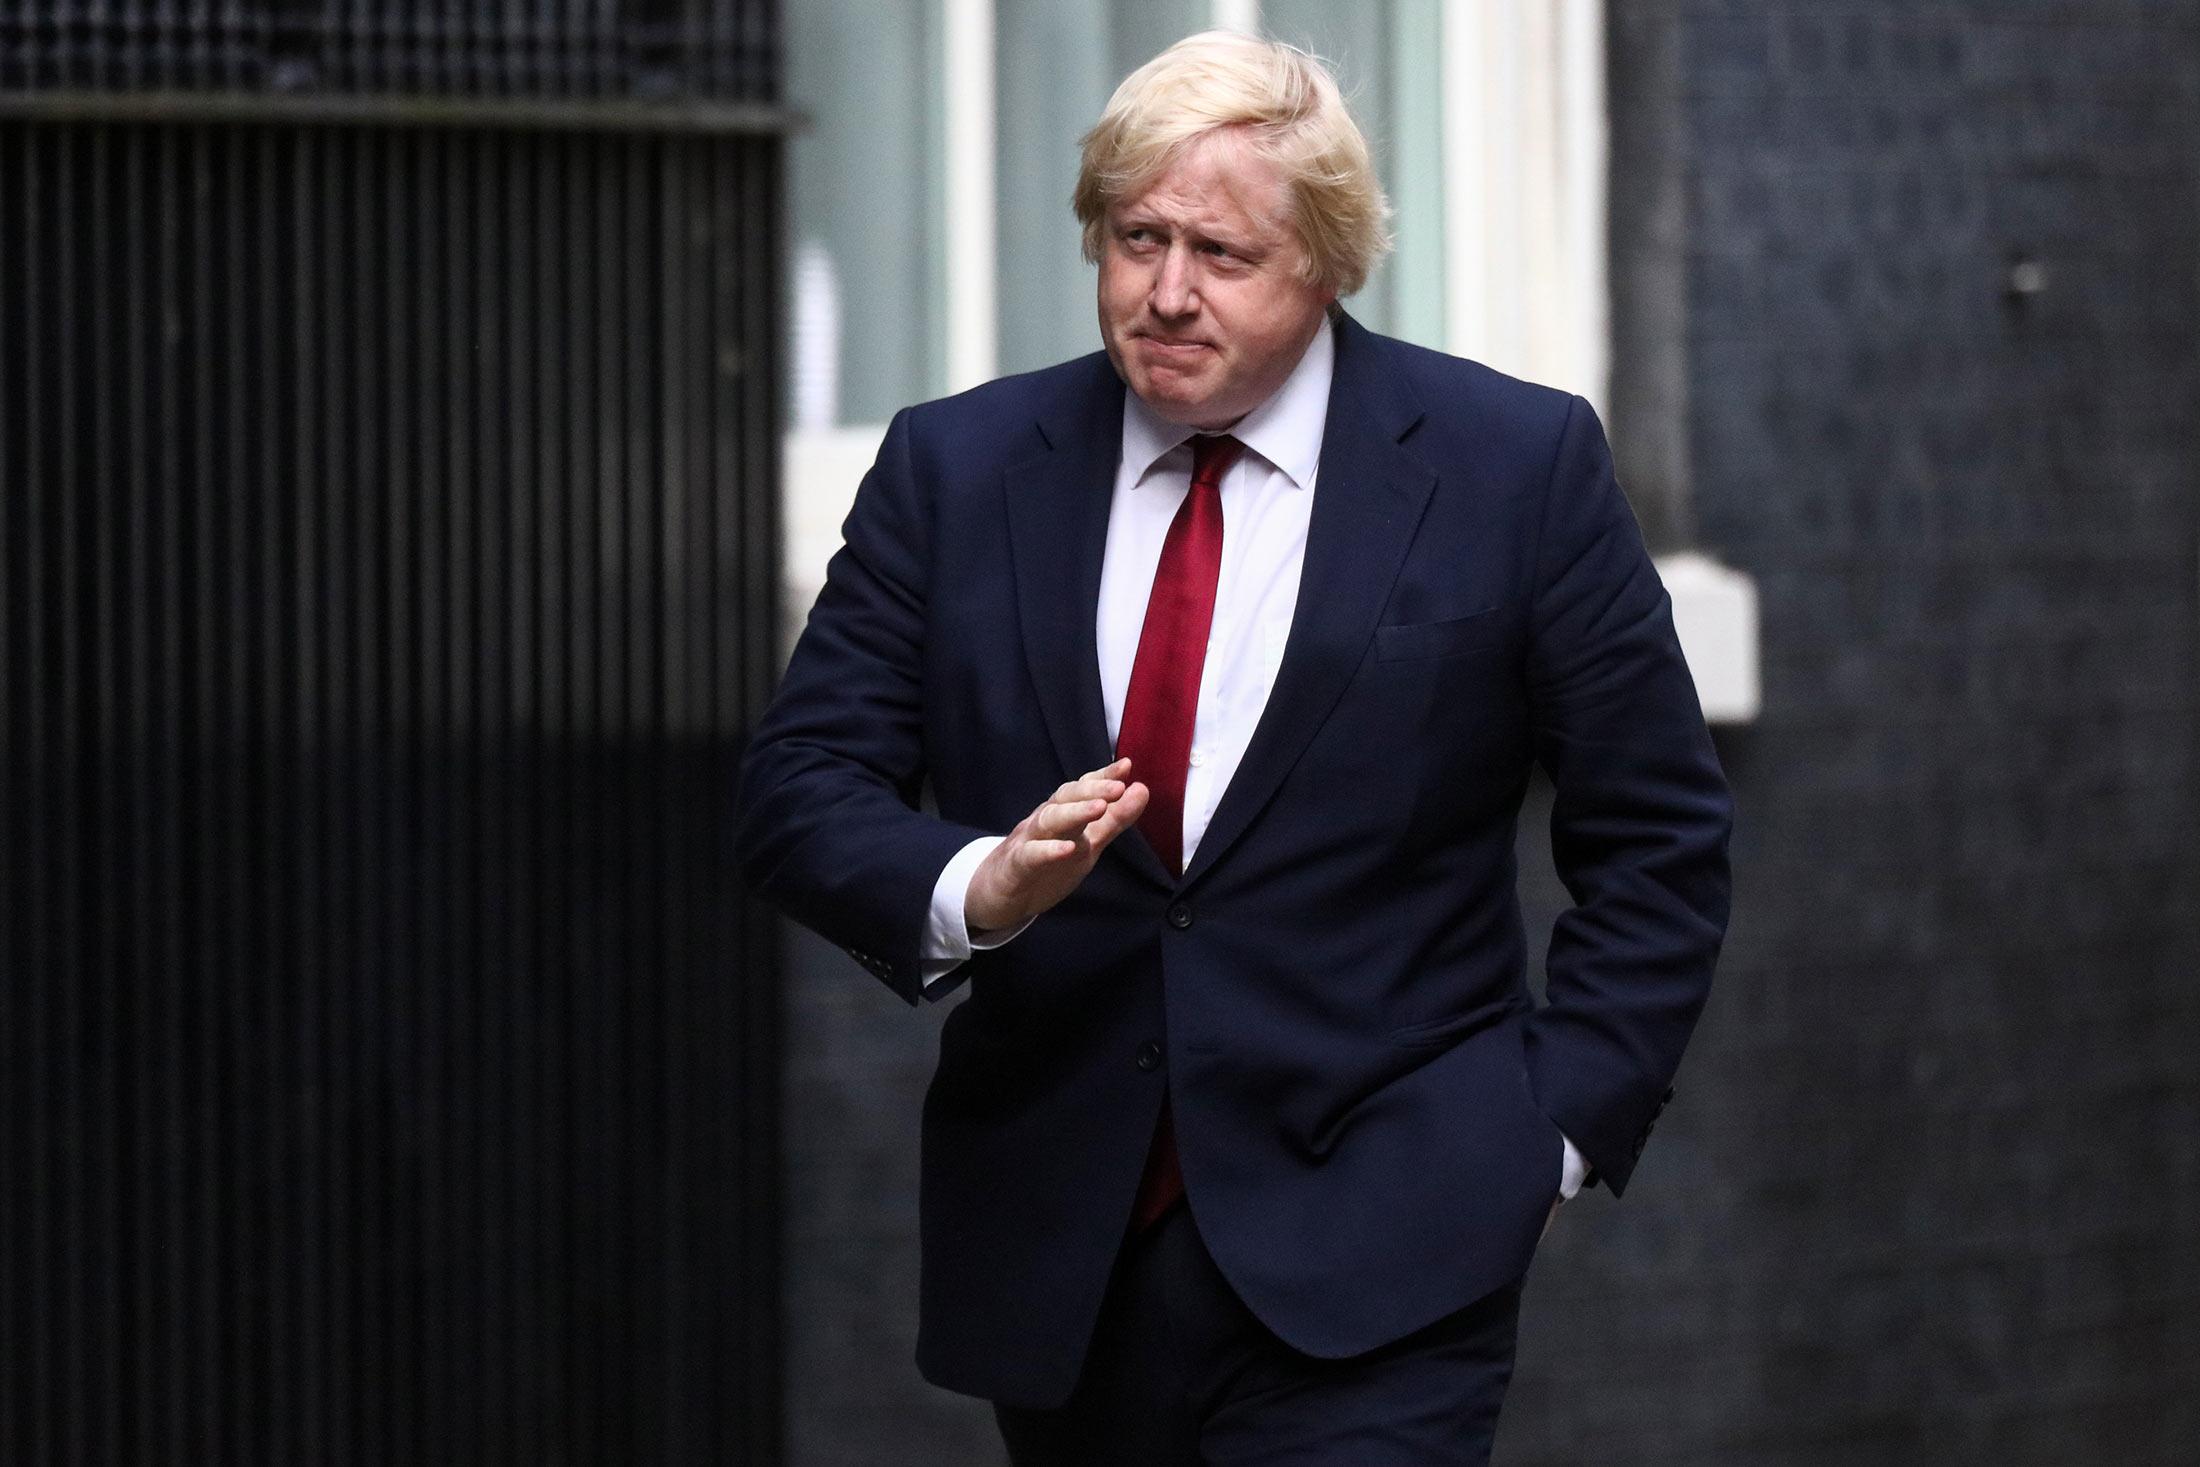 фото ЗакС политика Британский премьер Борис Джонсон подхватил коронавирус